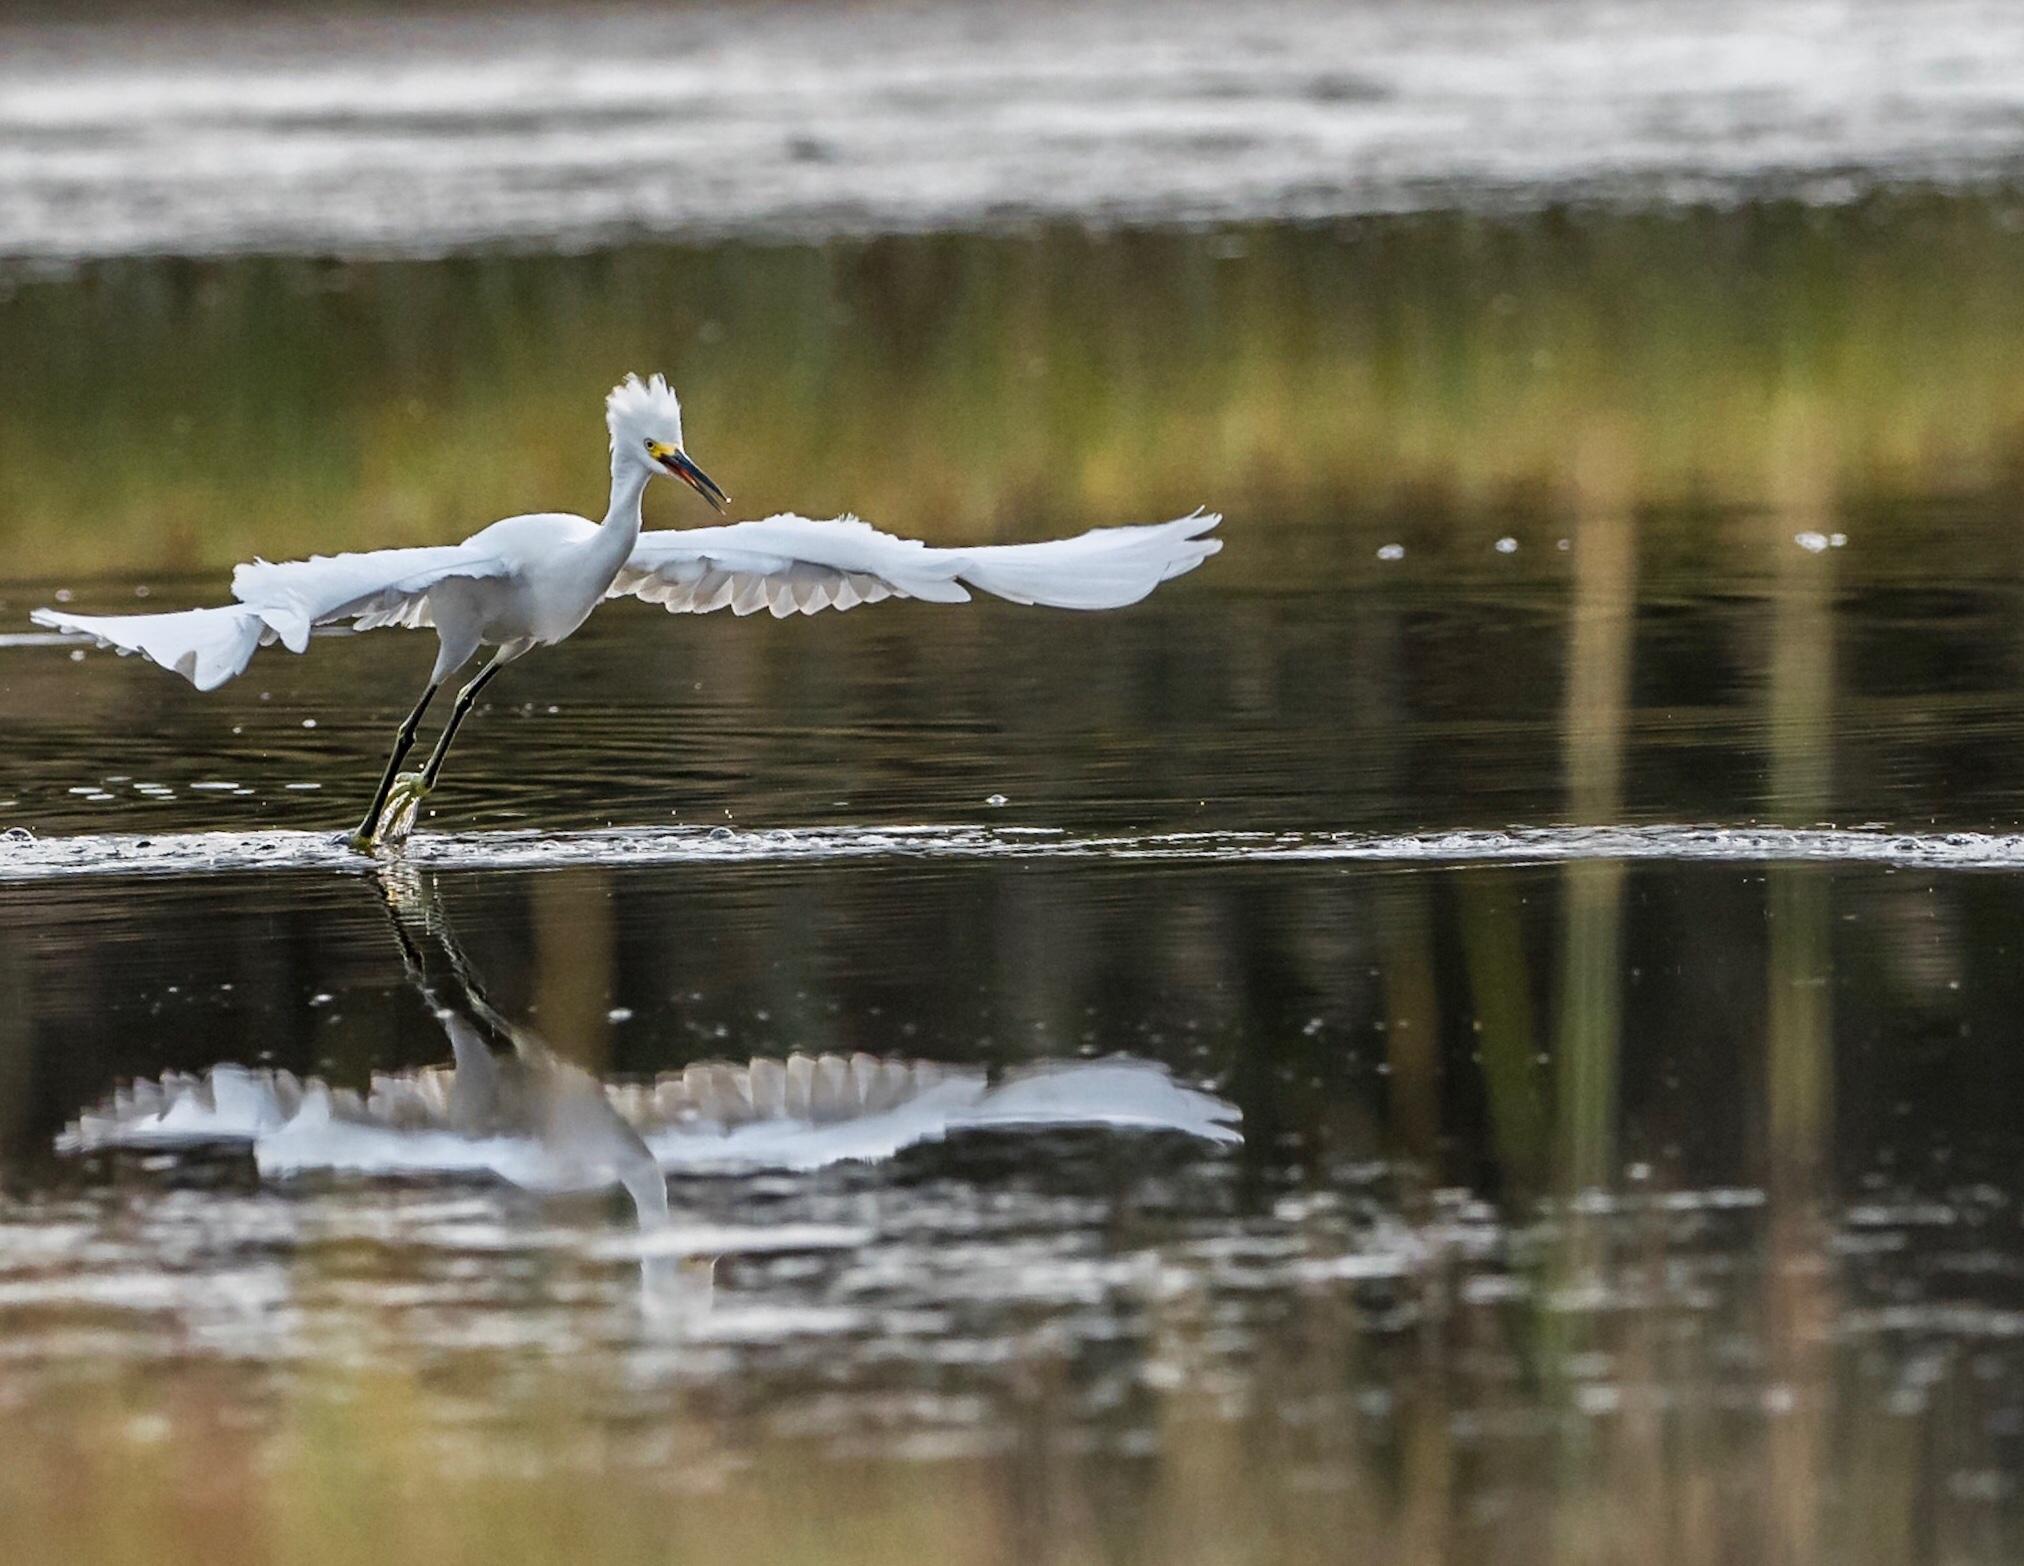 Juvenile Great Egret skimming a salt marsh pool